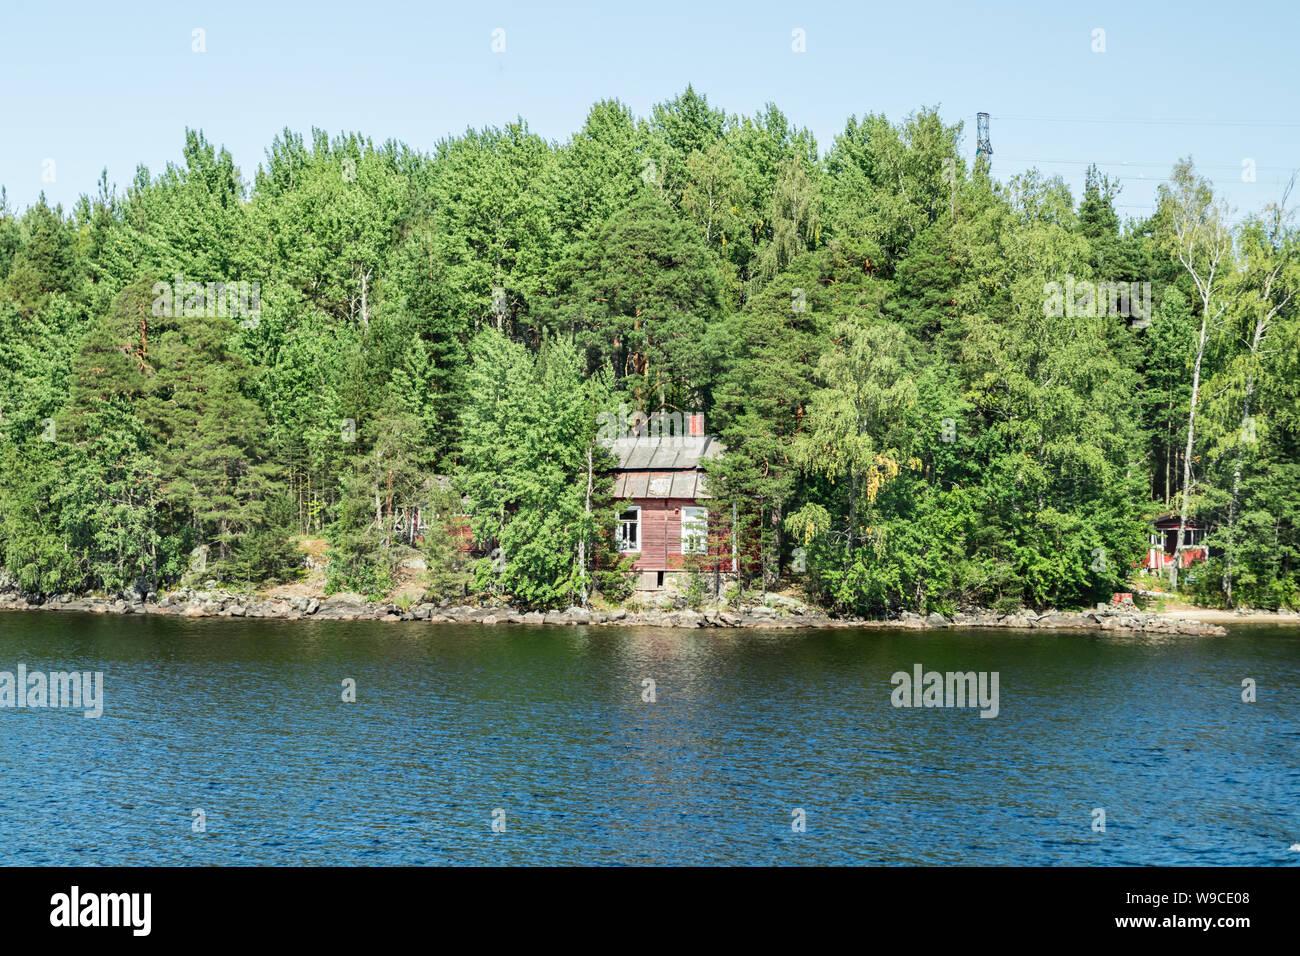 Red small finnish wooden house on island on the lake Saimaa. Lappeenranta, Finland. Stock Photo